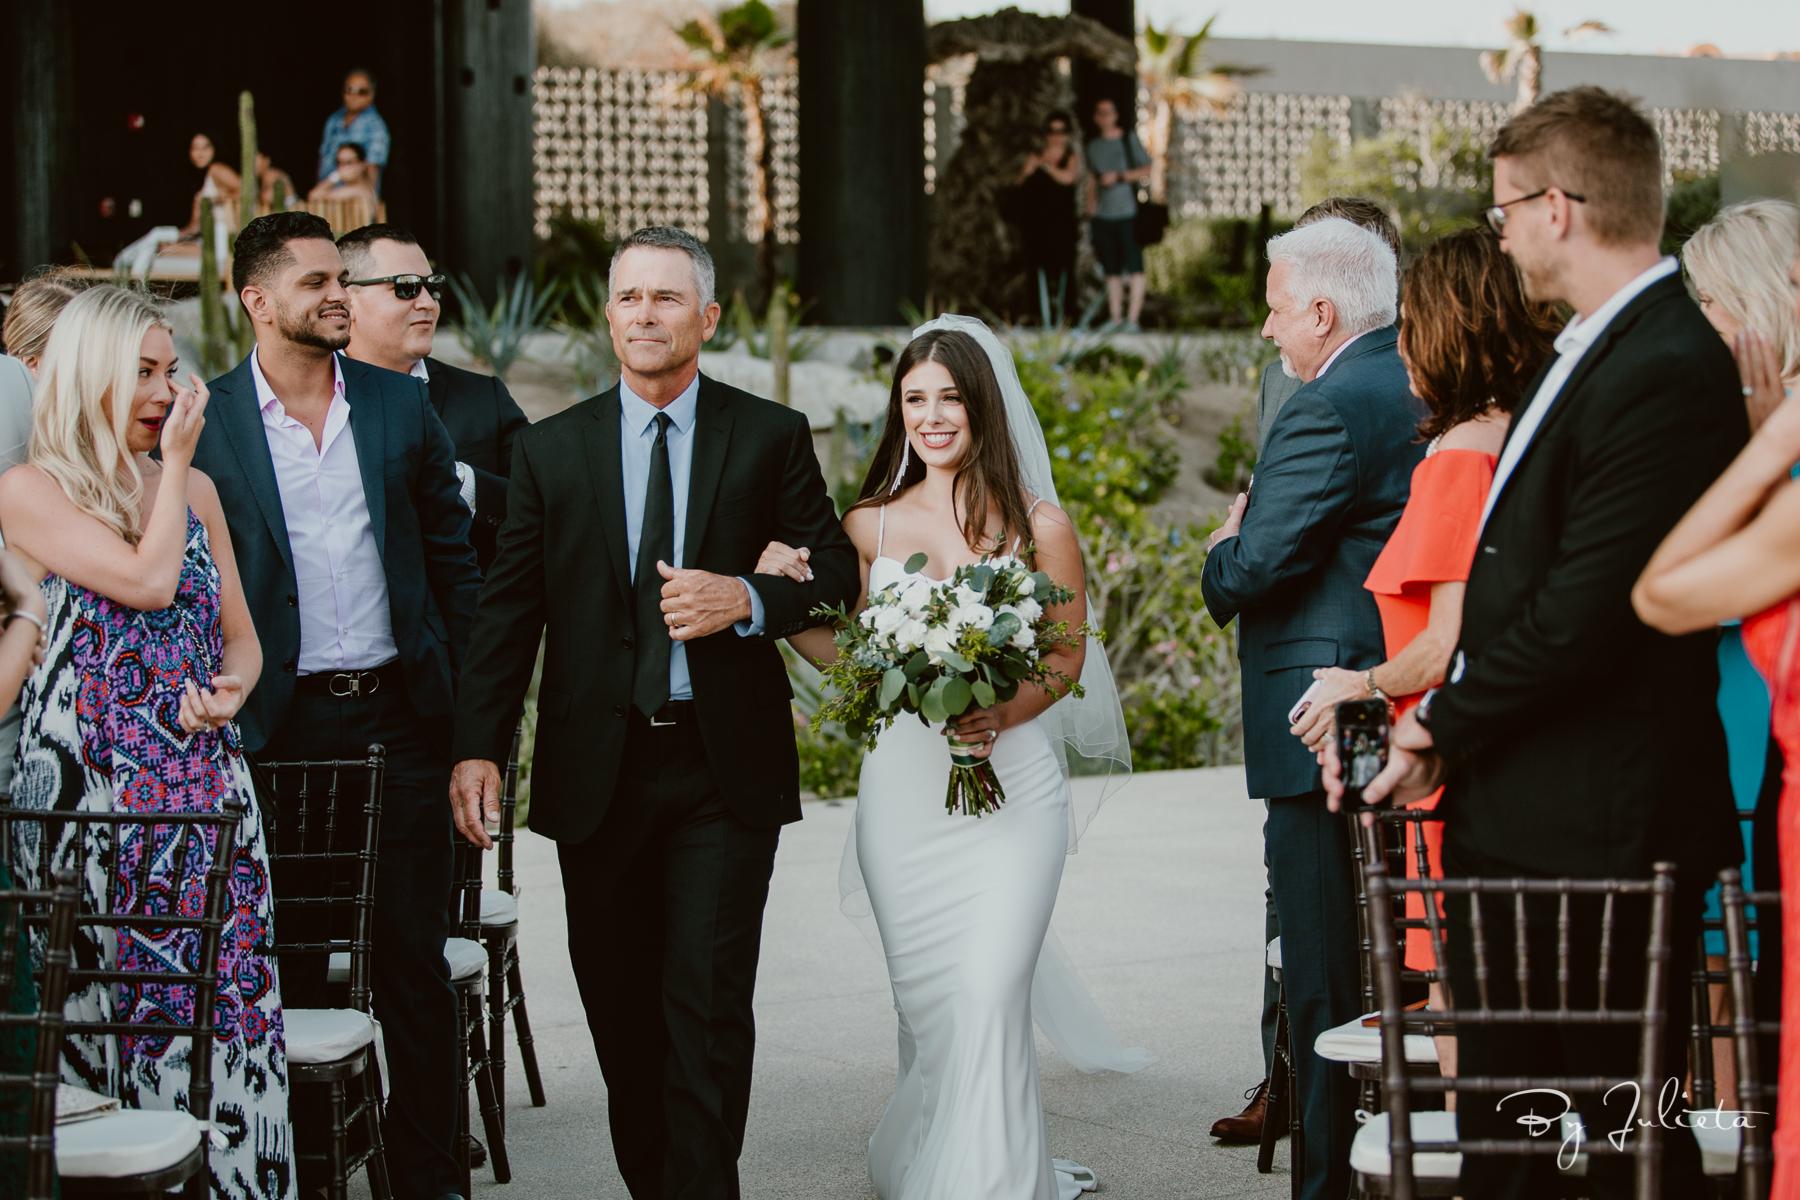 WeddingTheCapeCabo.B+G.JulietaAmezcuaPhotography.(253of533).jpg